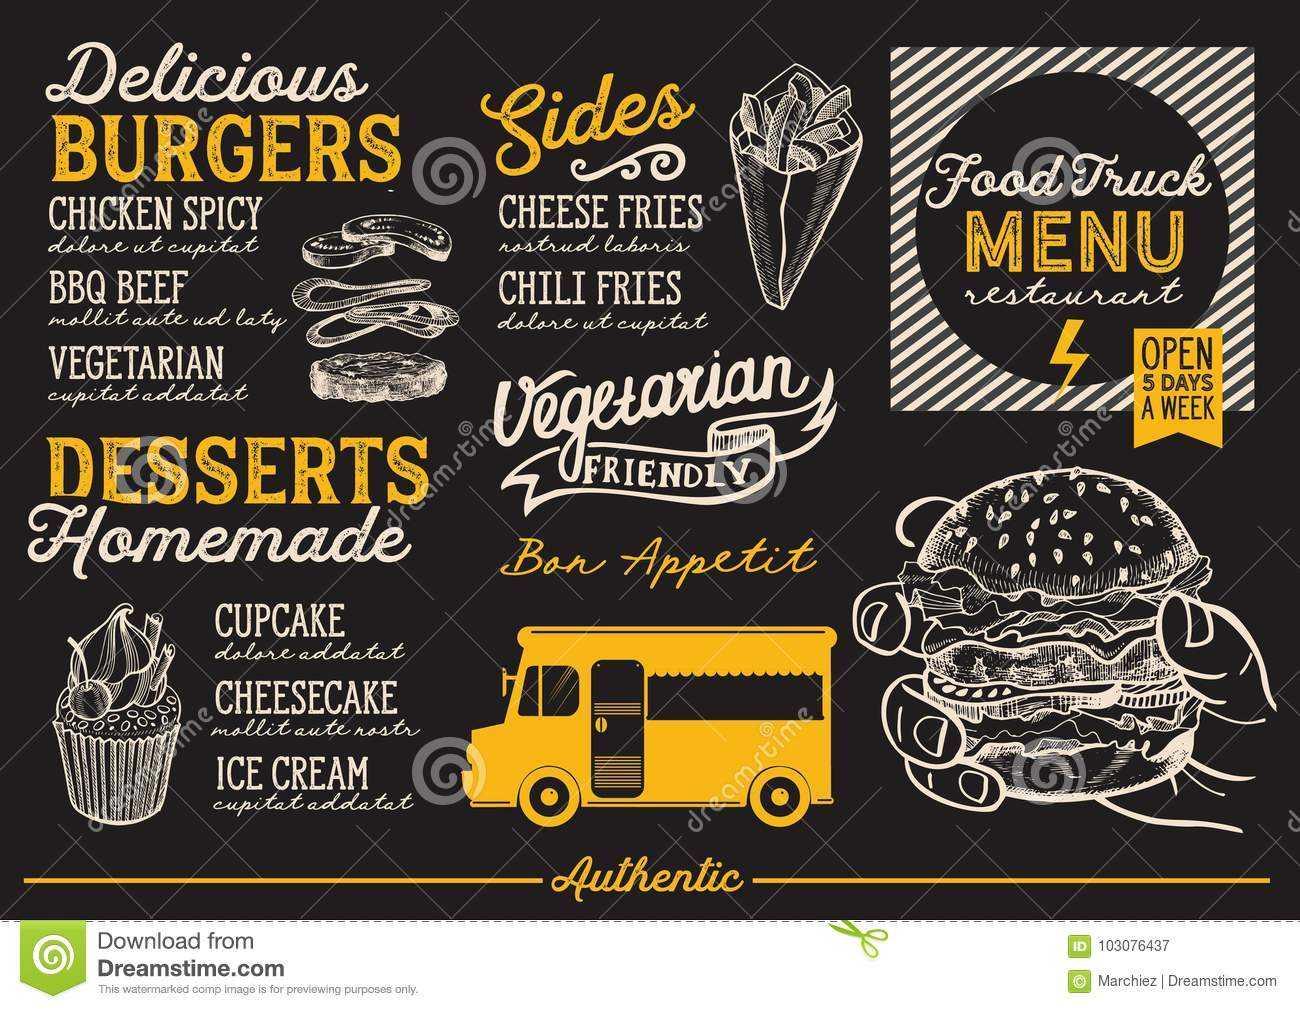 Food Truck Menu Template. Stock Vector. Illustration Of Hand Inside Food Truck Menu Template